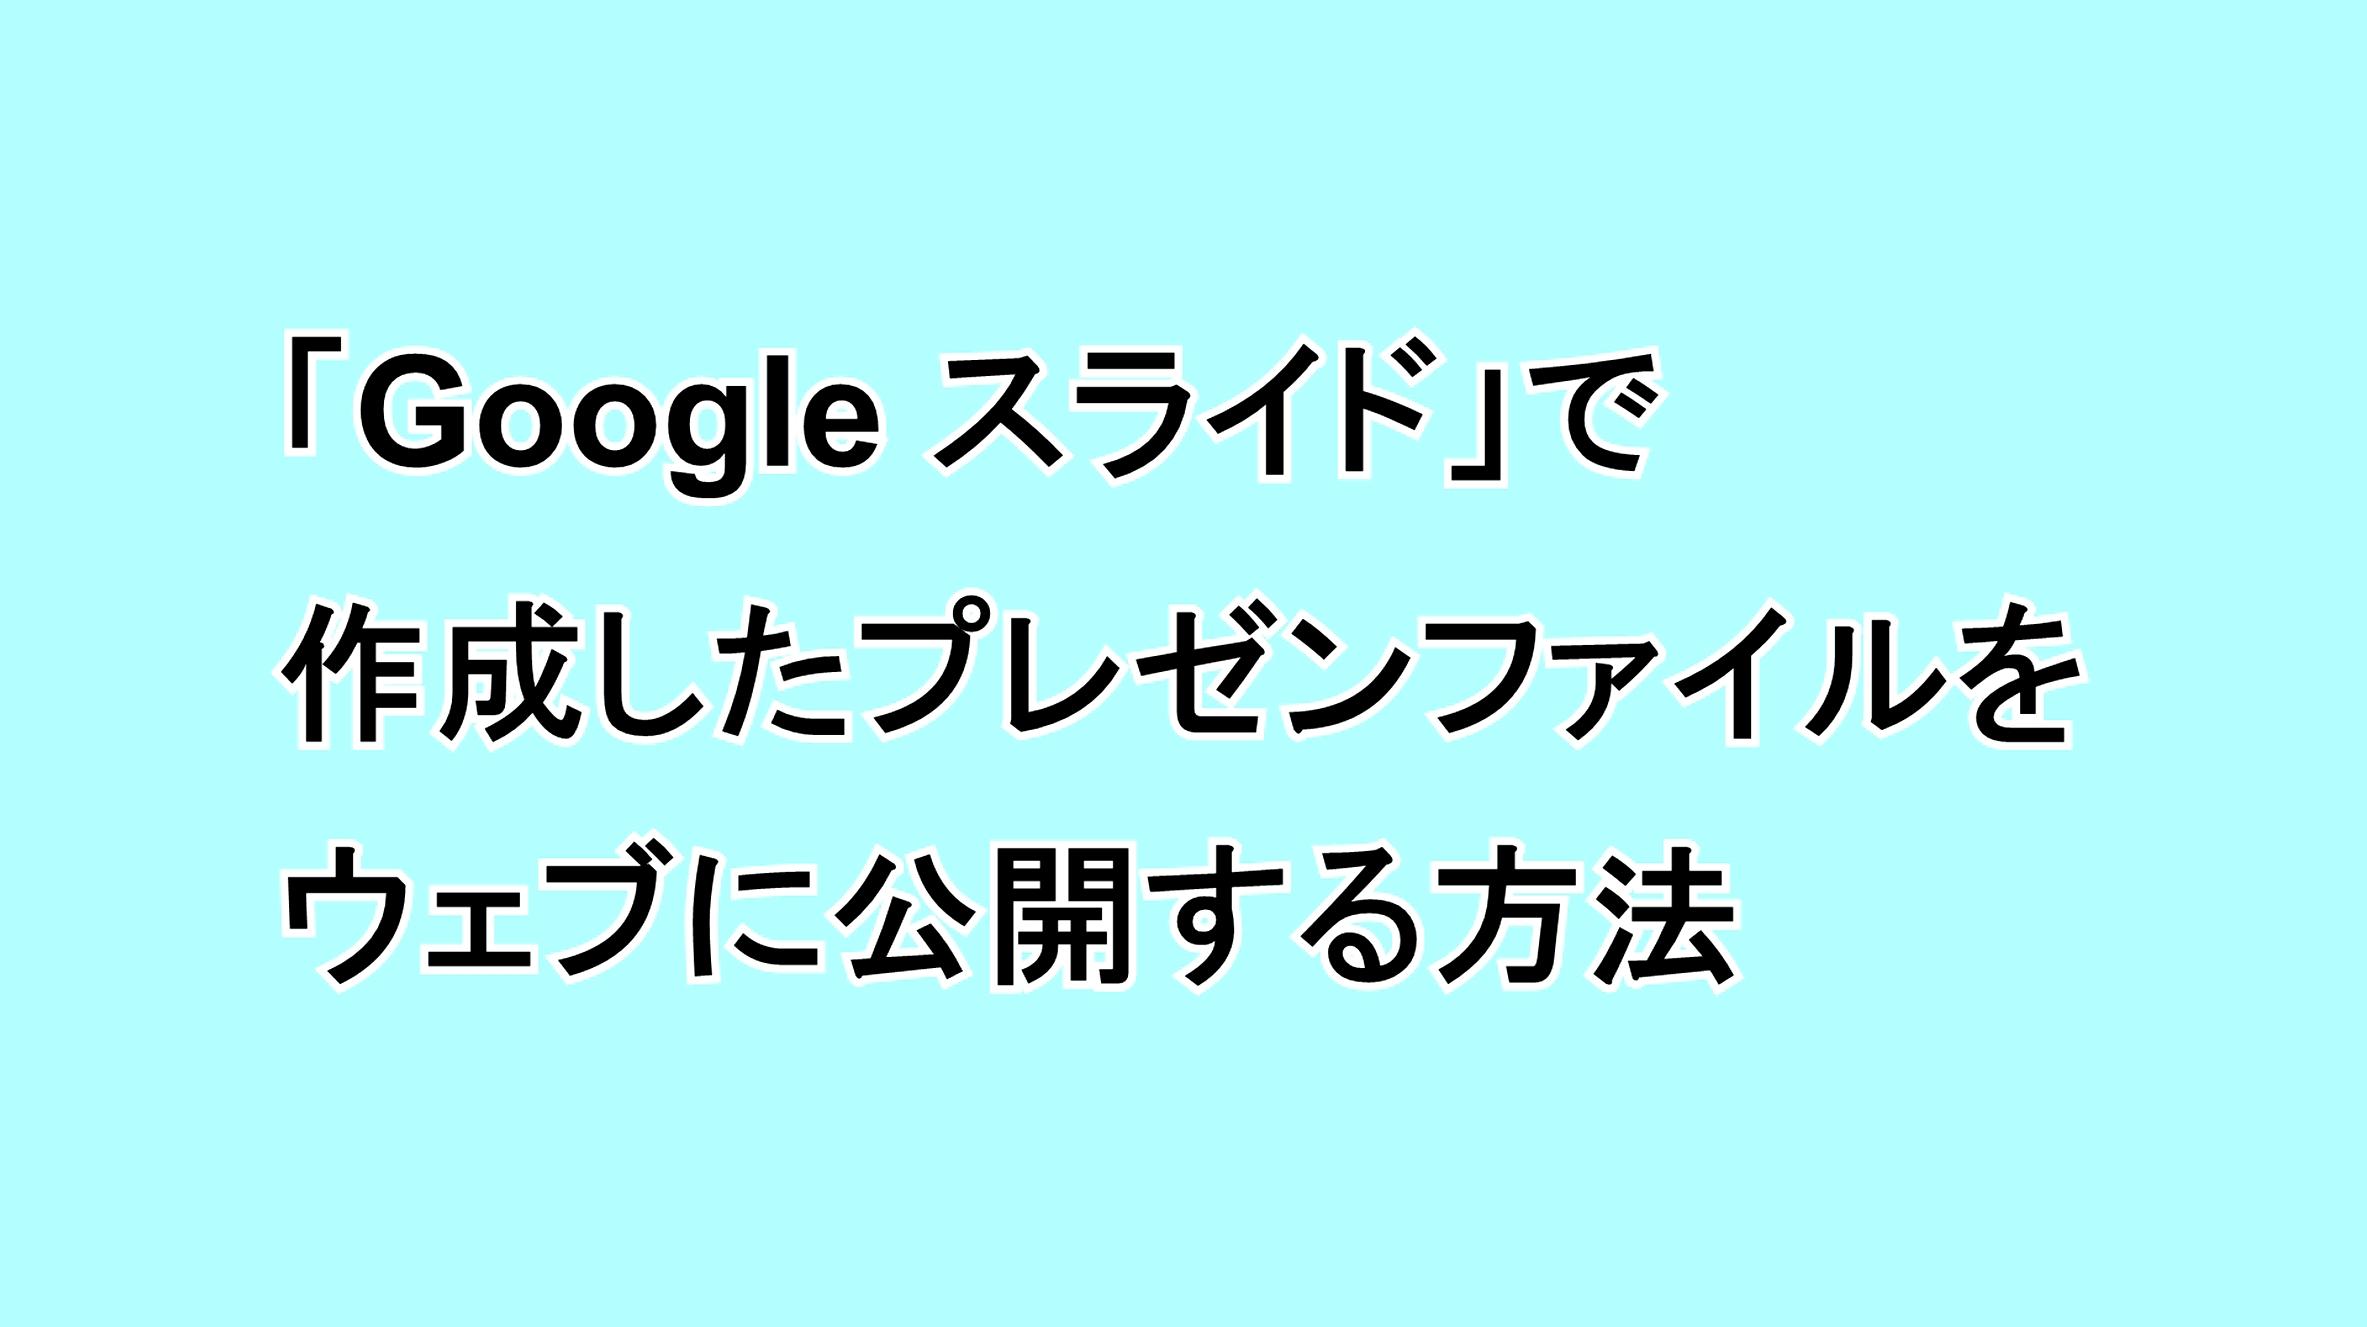 「Google スライド」で作成したプレゼンファイルをウェブに公開する方法